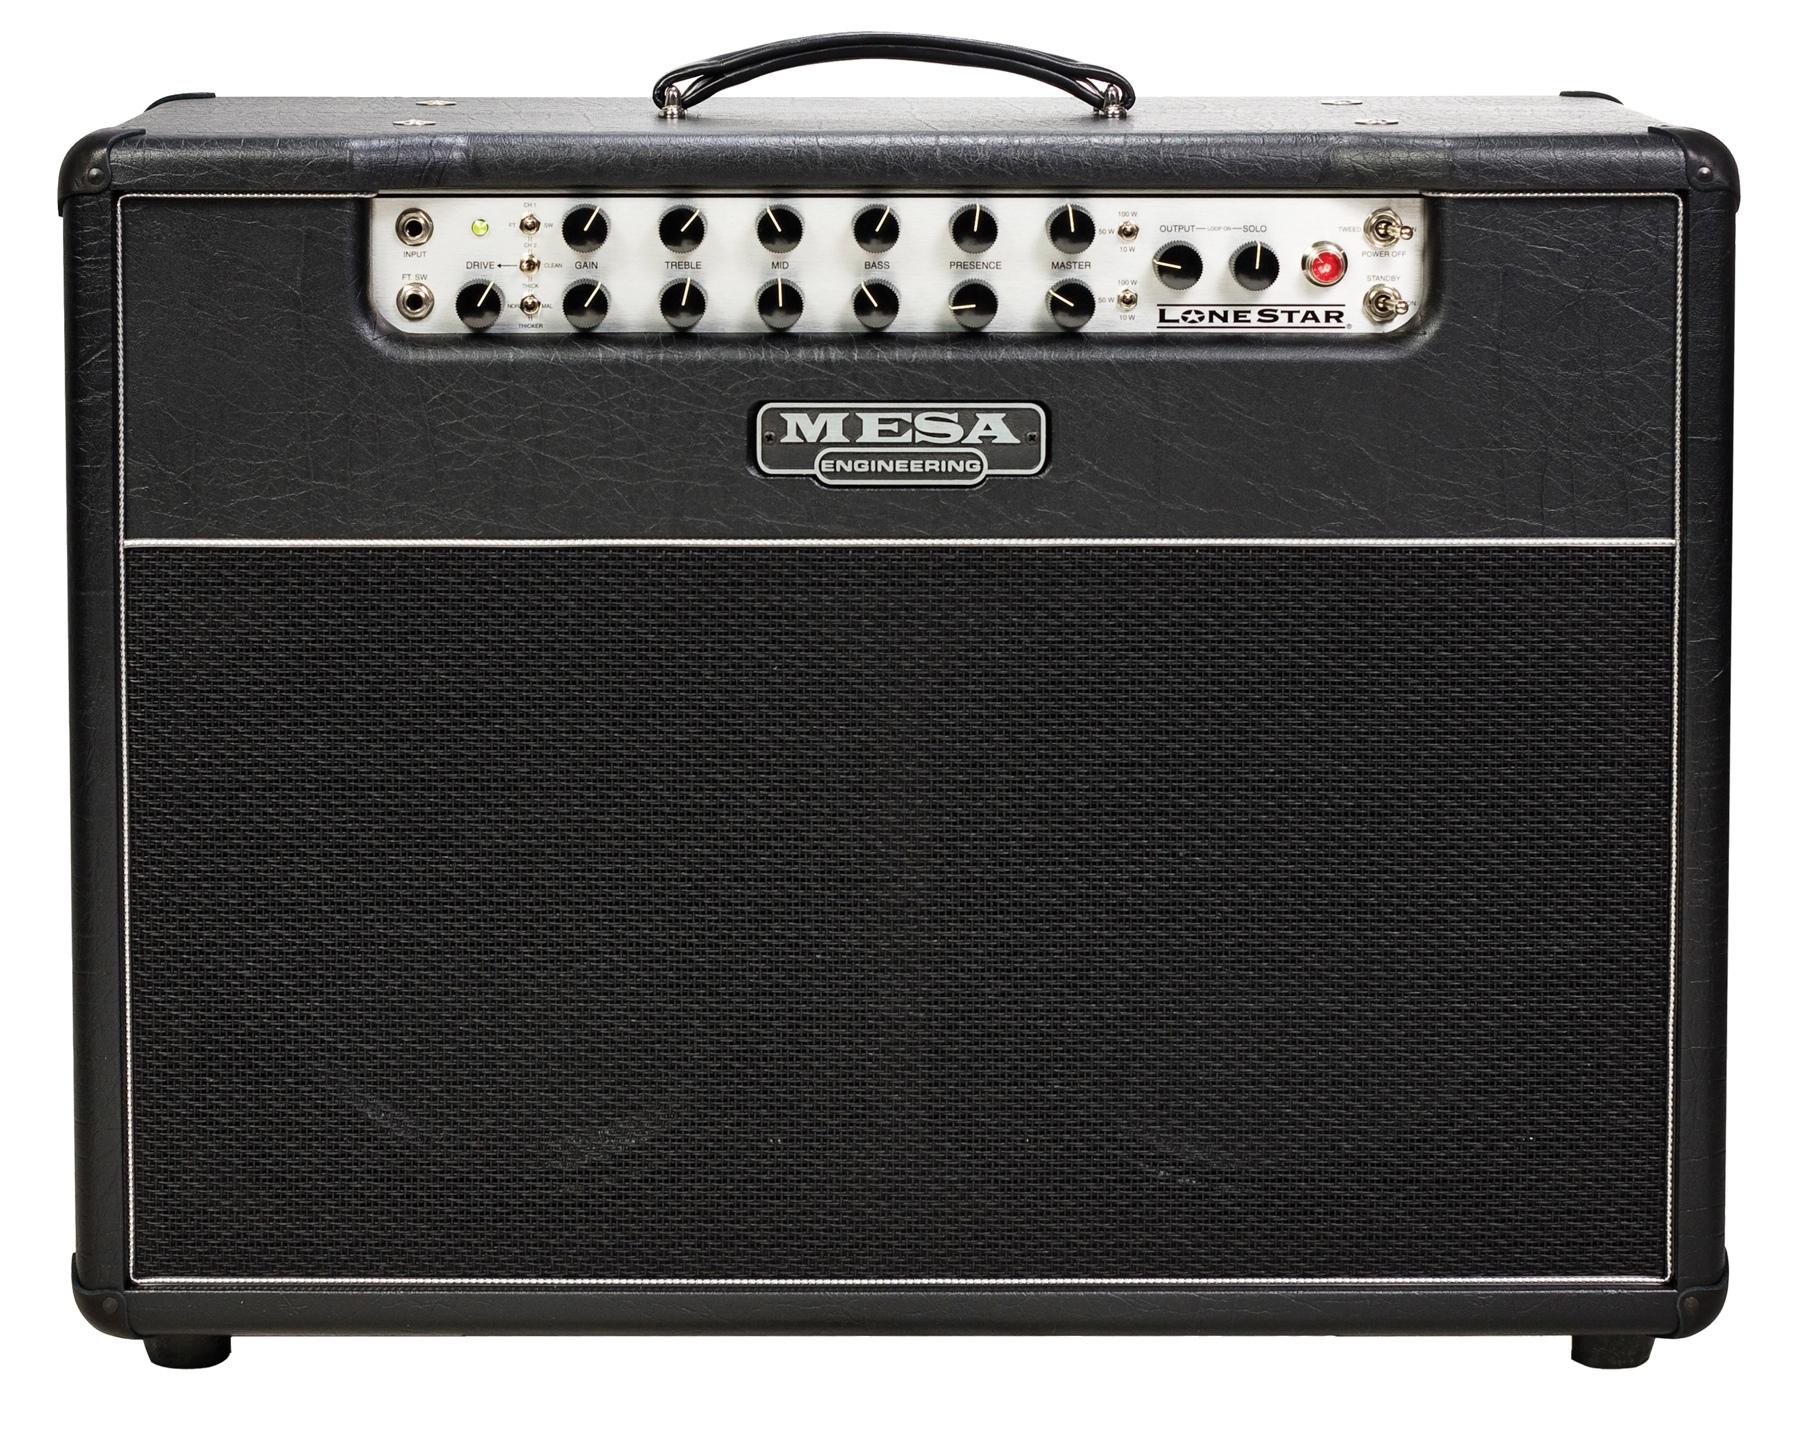 Mesa Boogie - Lone Star - 212